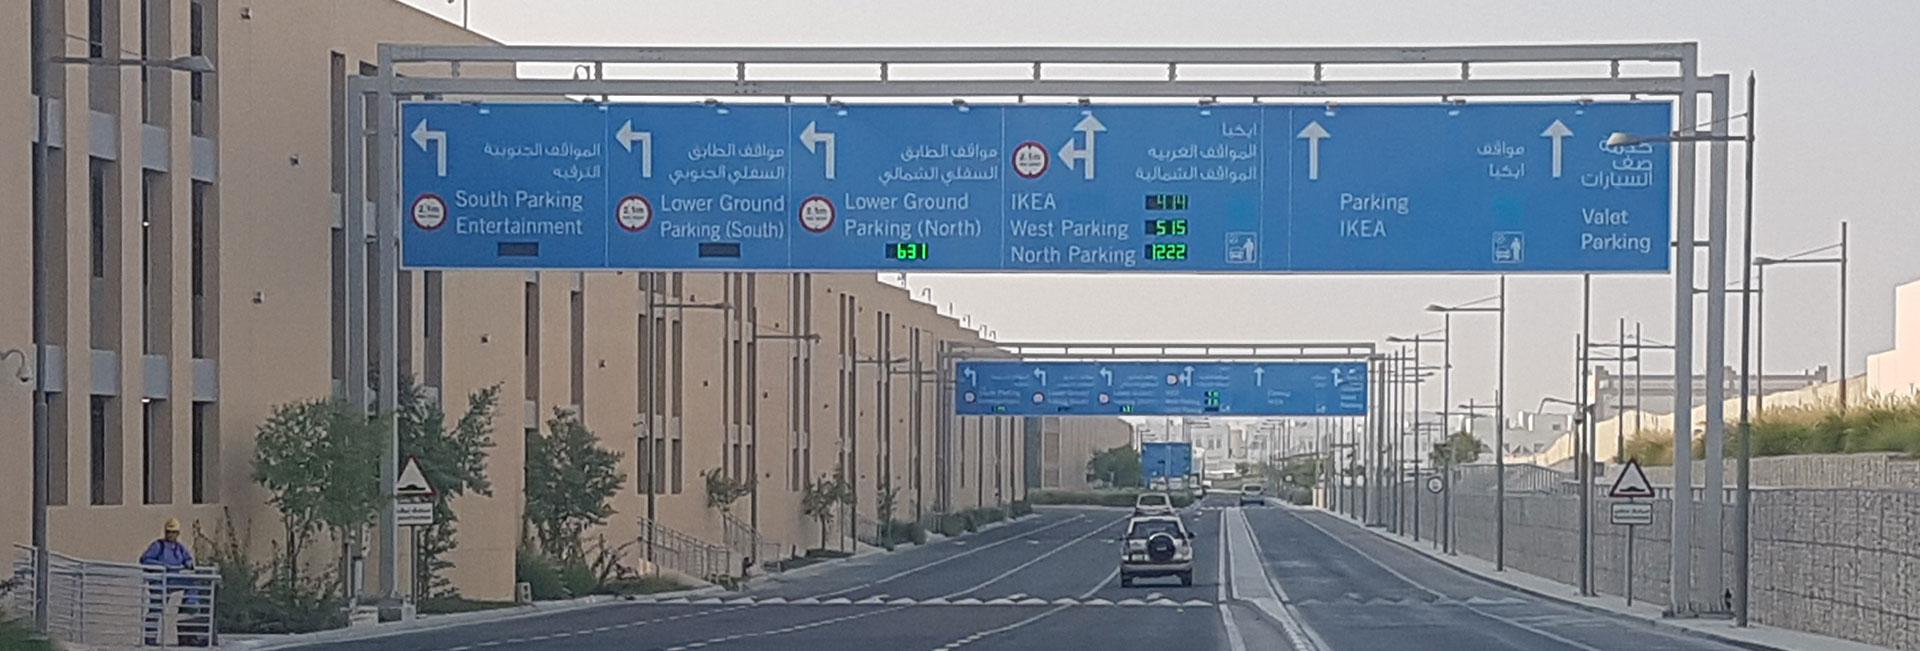 Gantry & Pylon Signs for Doha Festival City, Qatar   Joseph Group